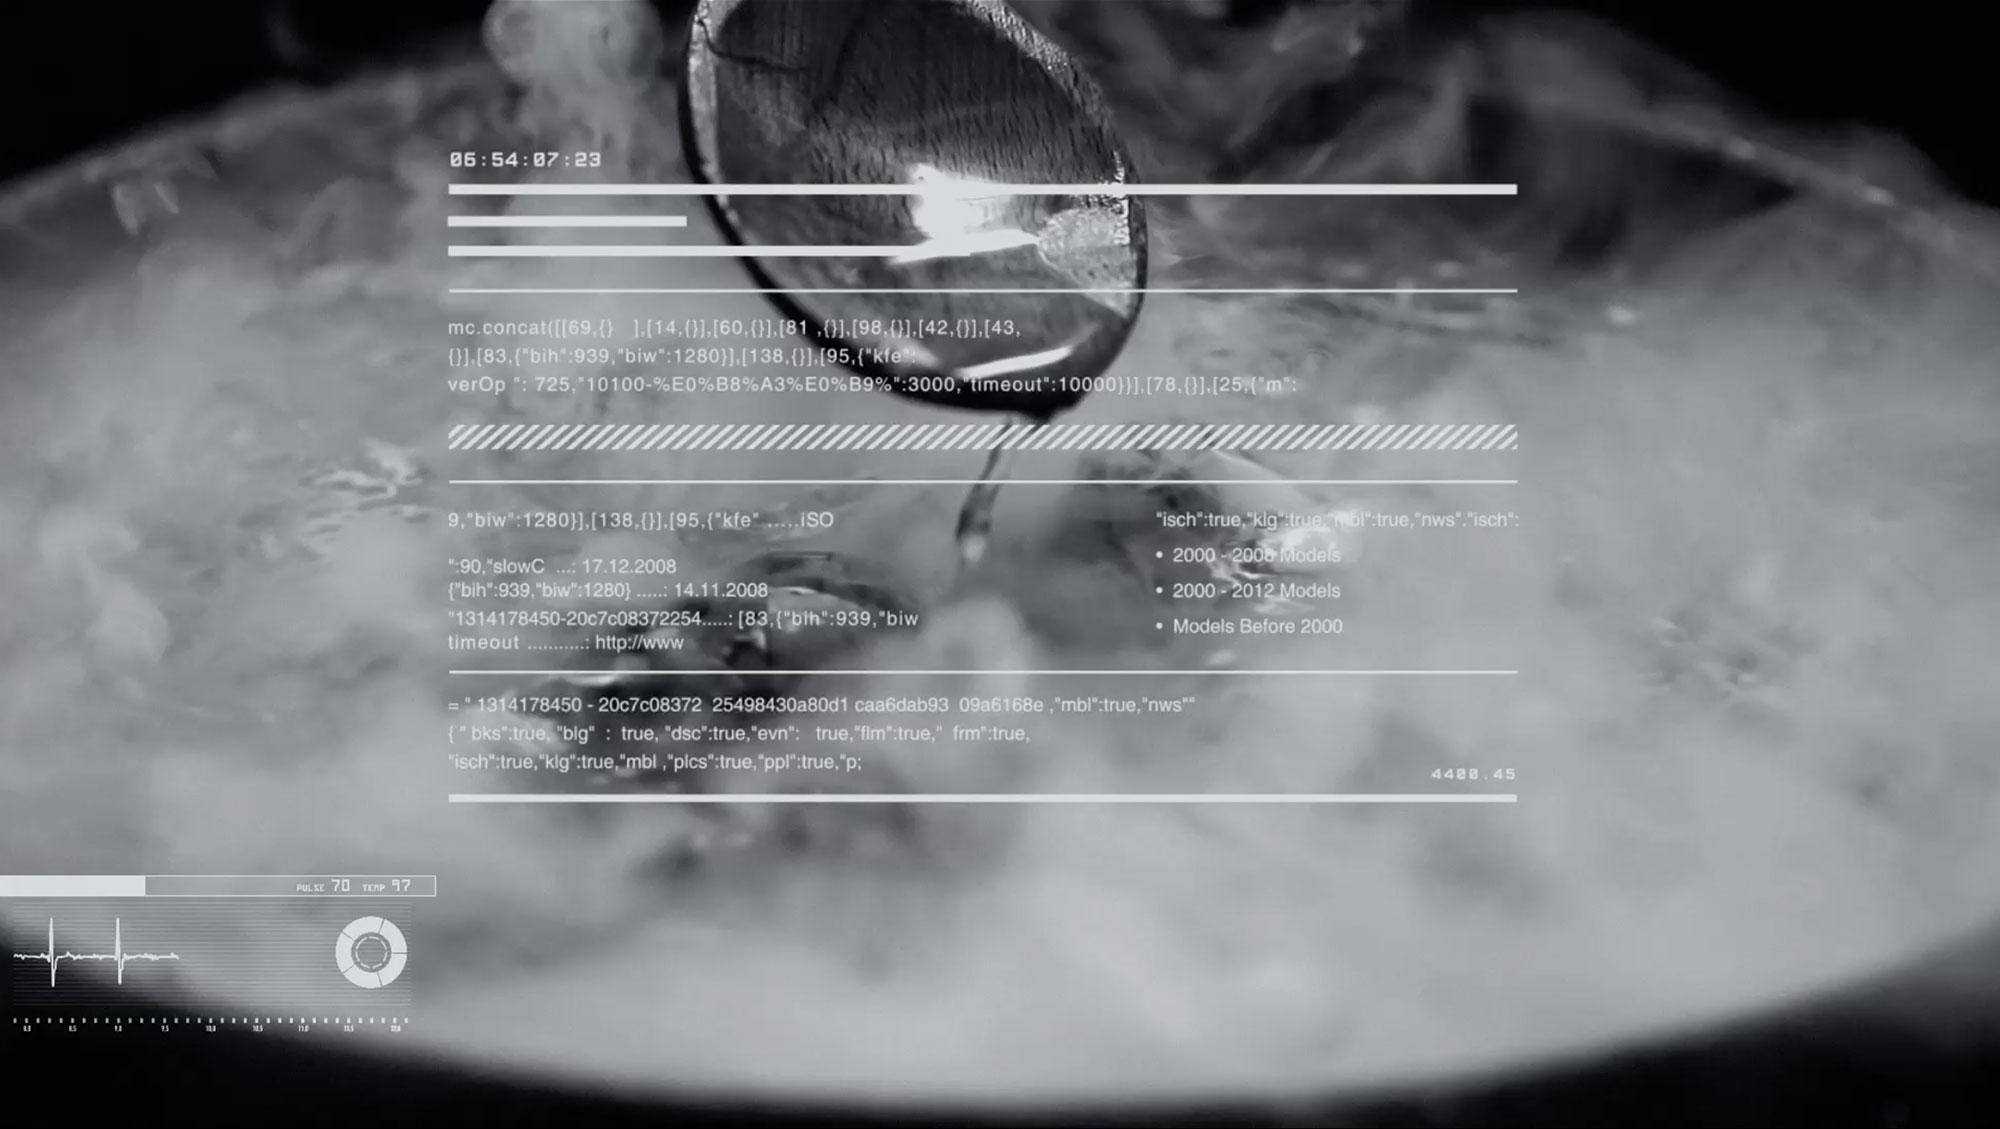 Jacek Doroszenko - I had to recompile the Kernel, video screen 7